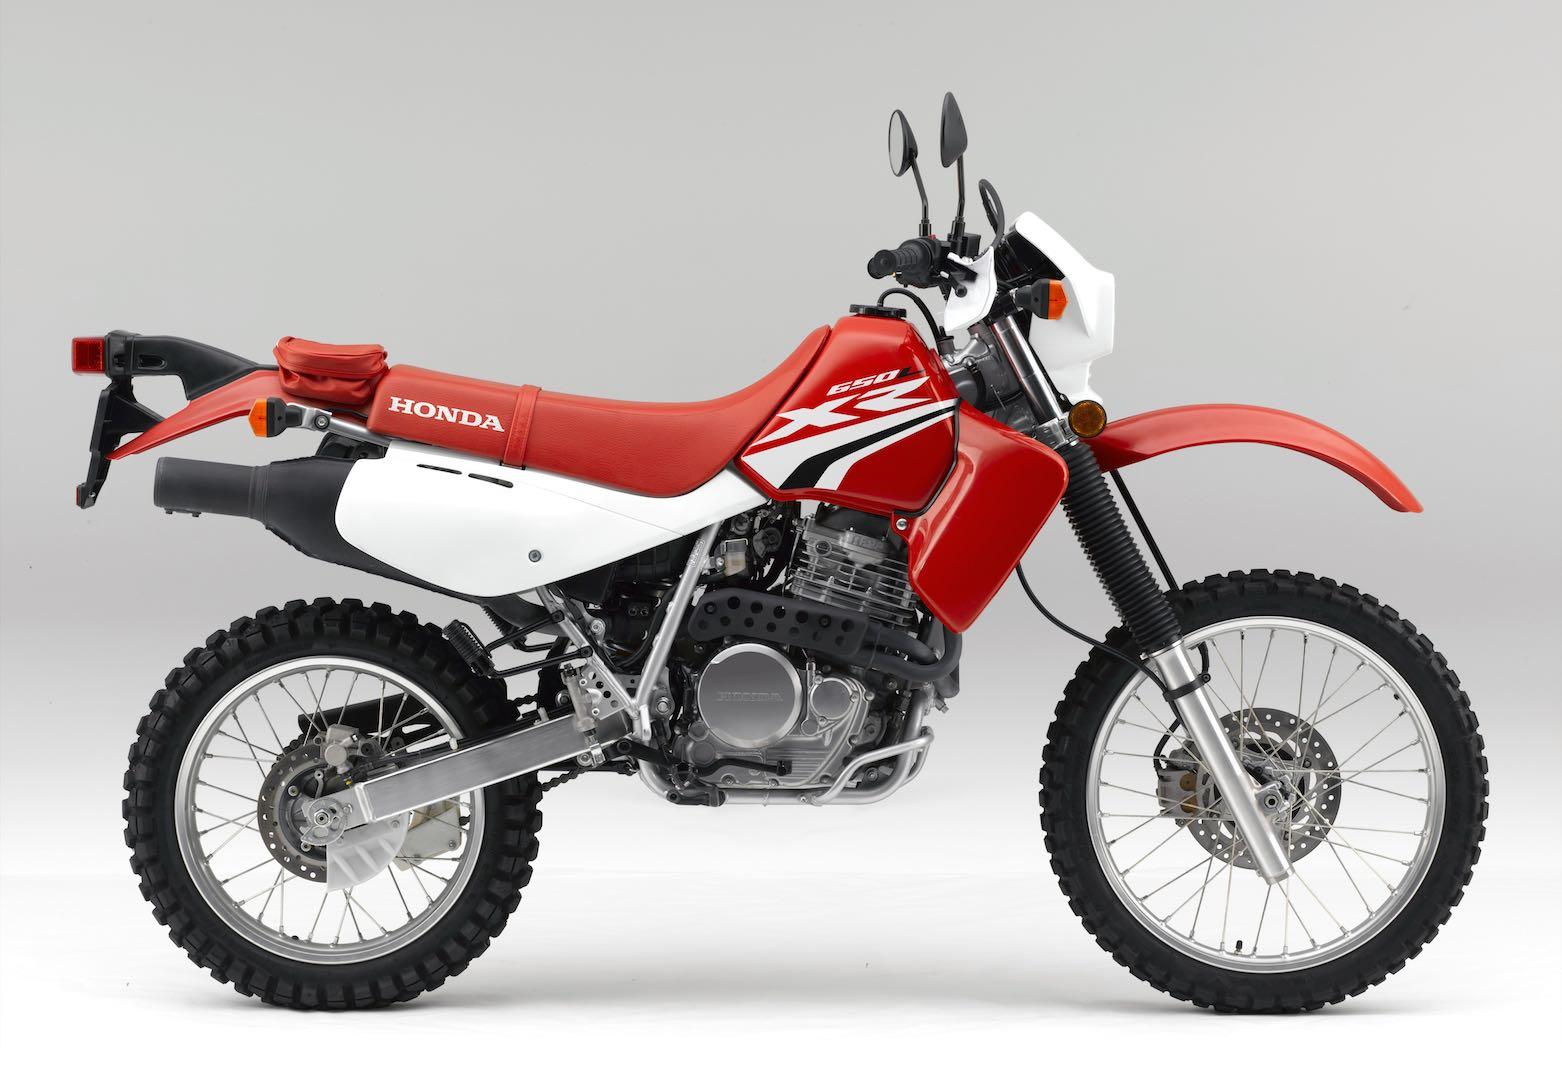 2020 Honda Xr650l Buyer S Guide Specs Price